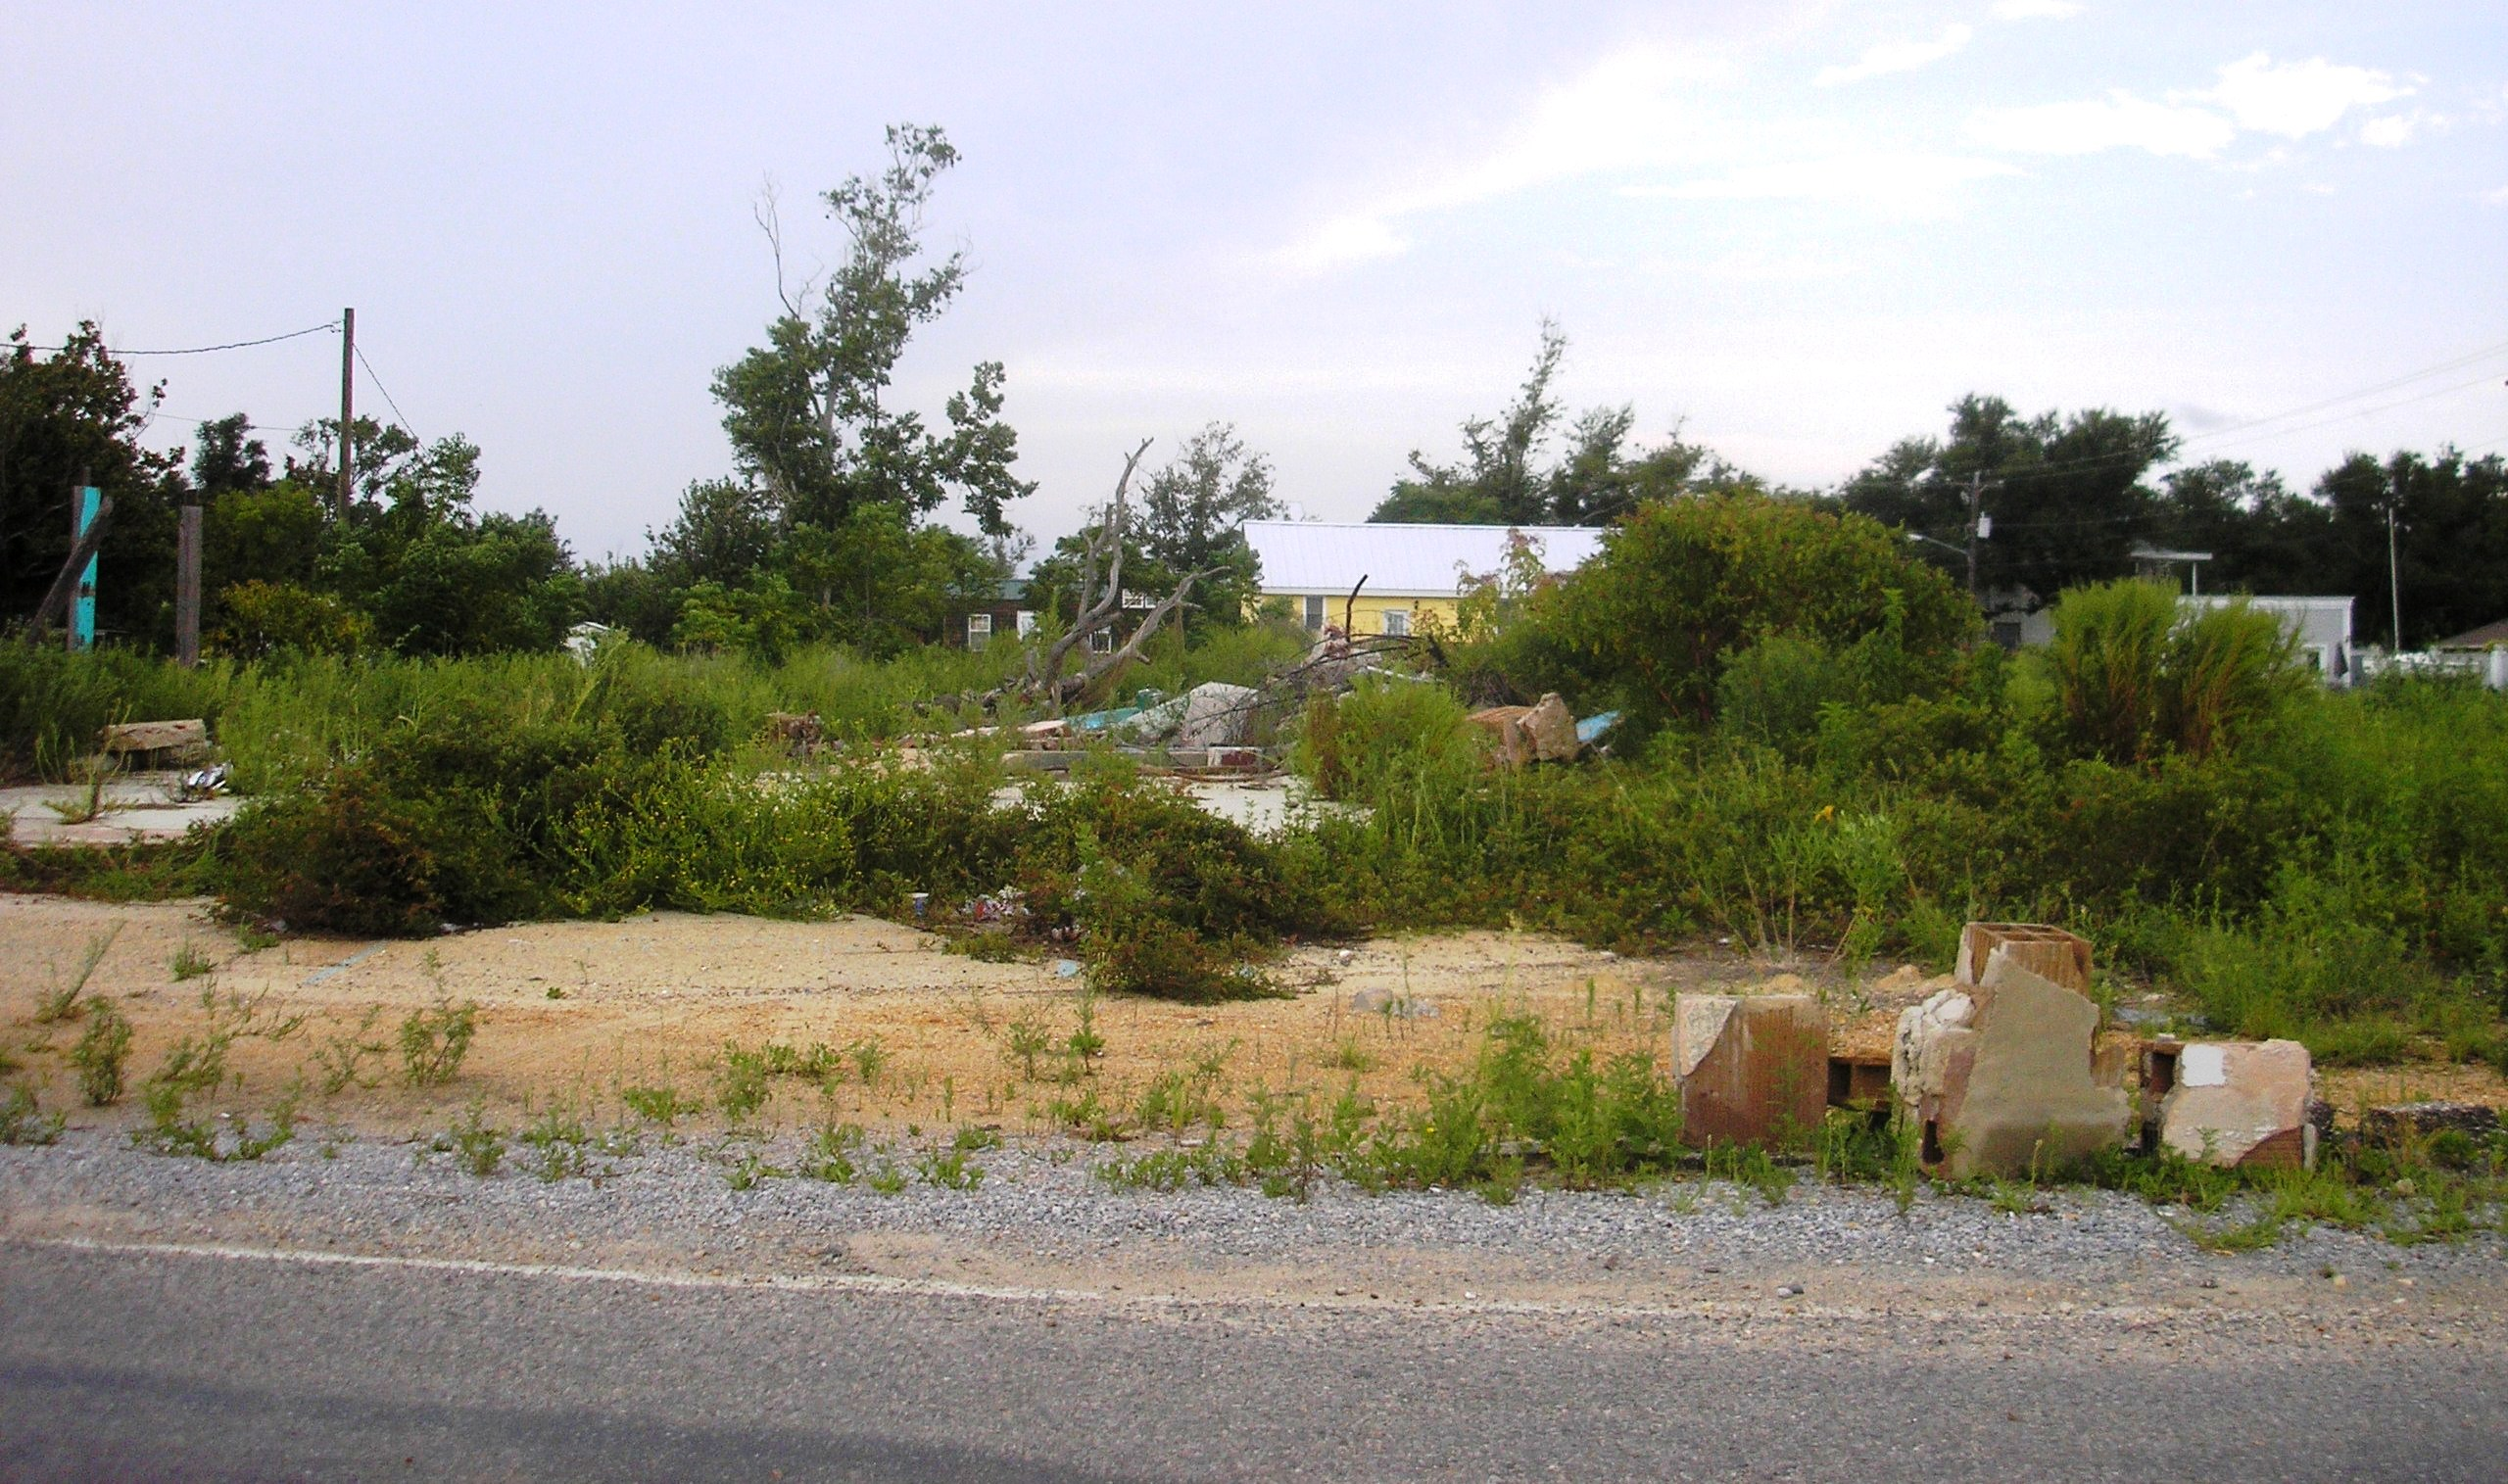 Lot on Beach Boulevard 3 years after Katrina